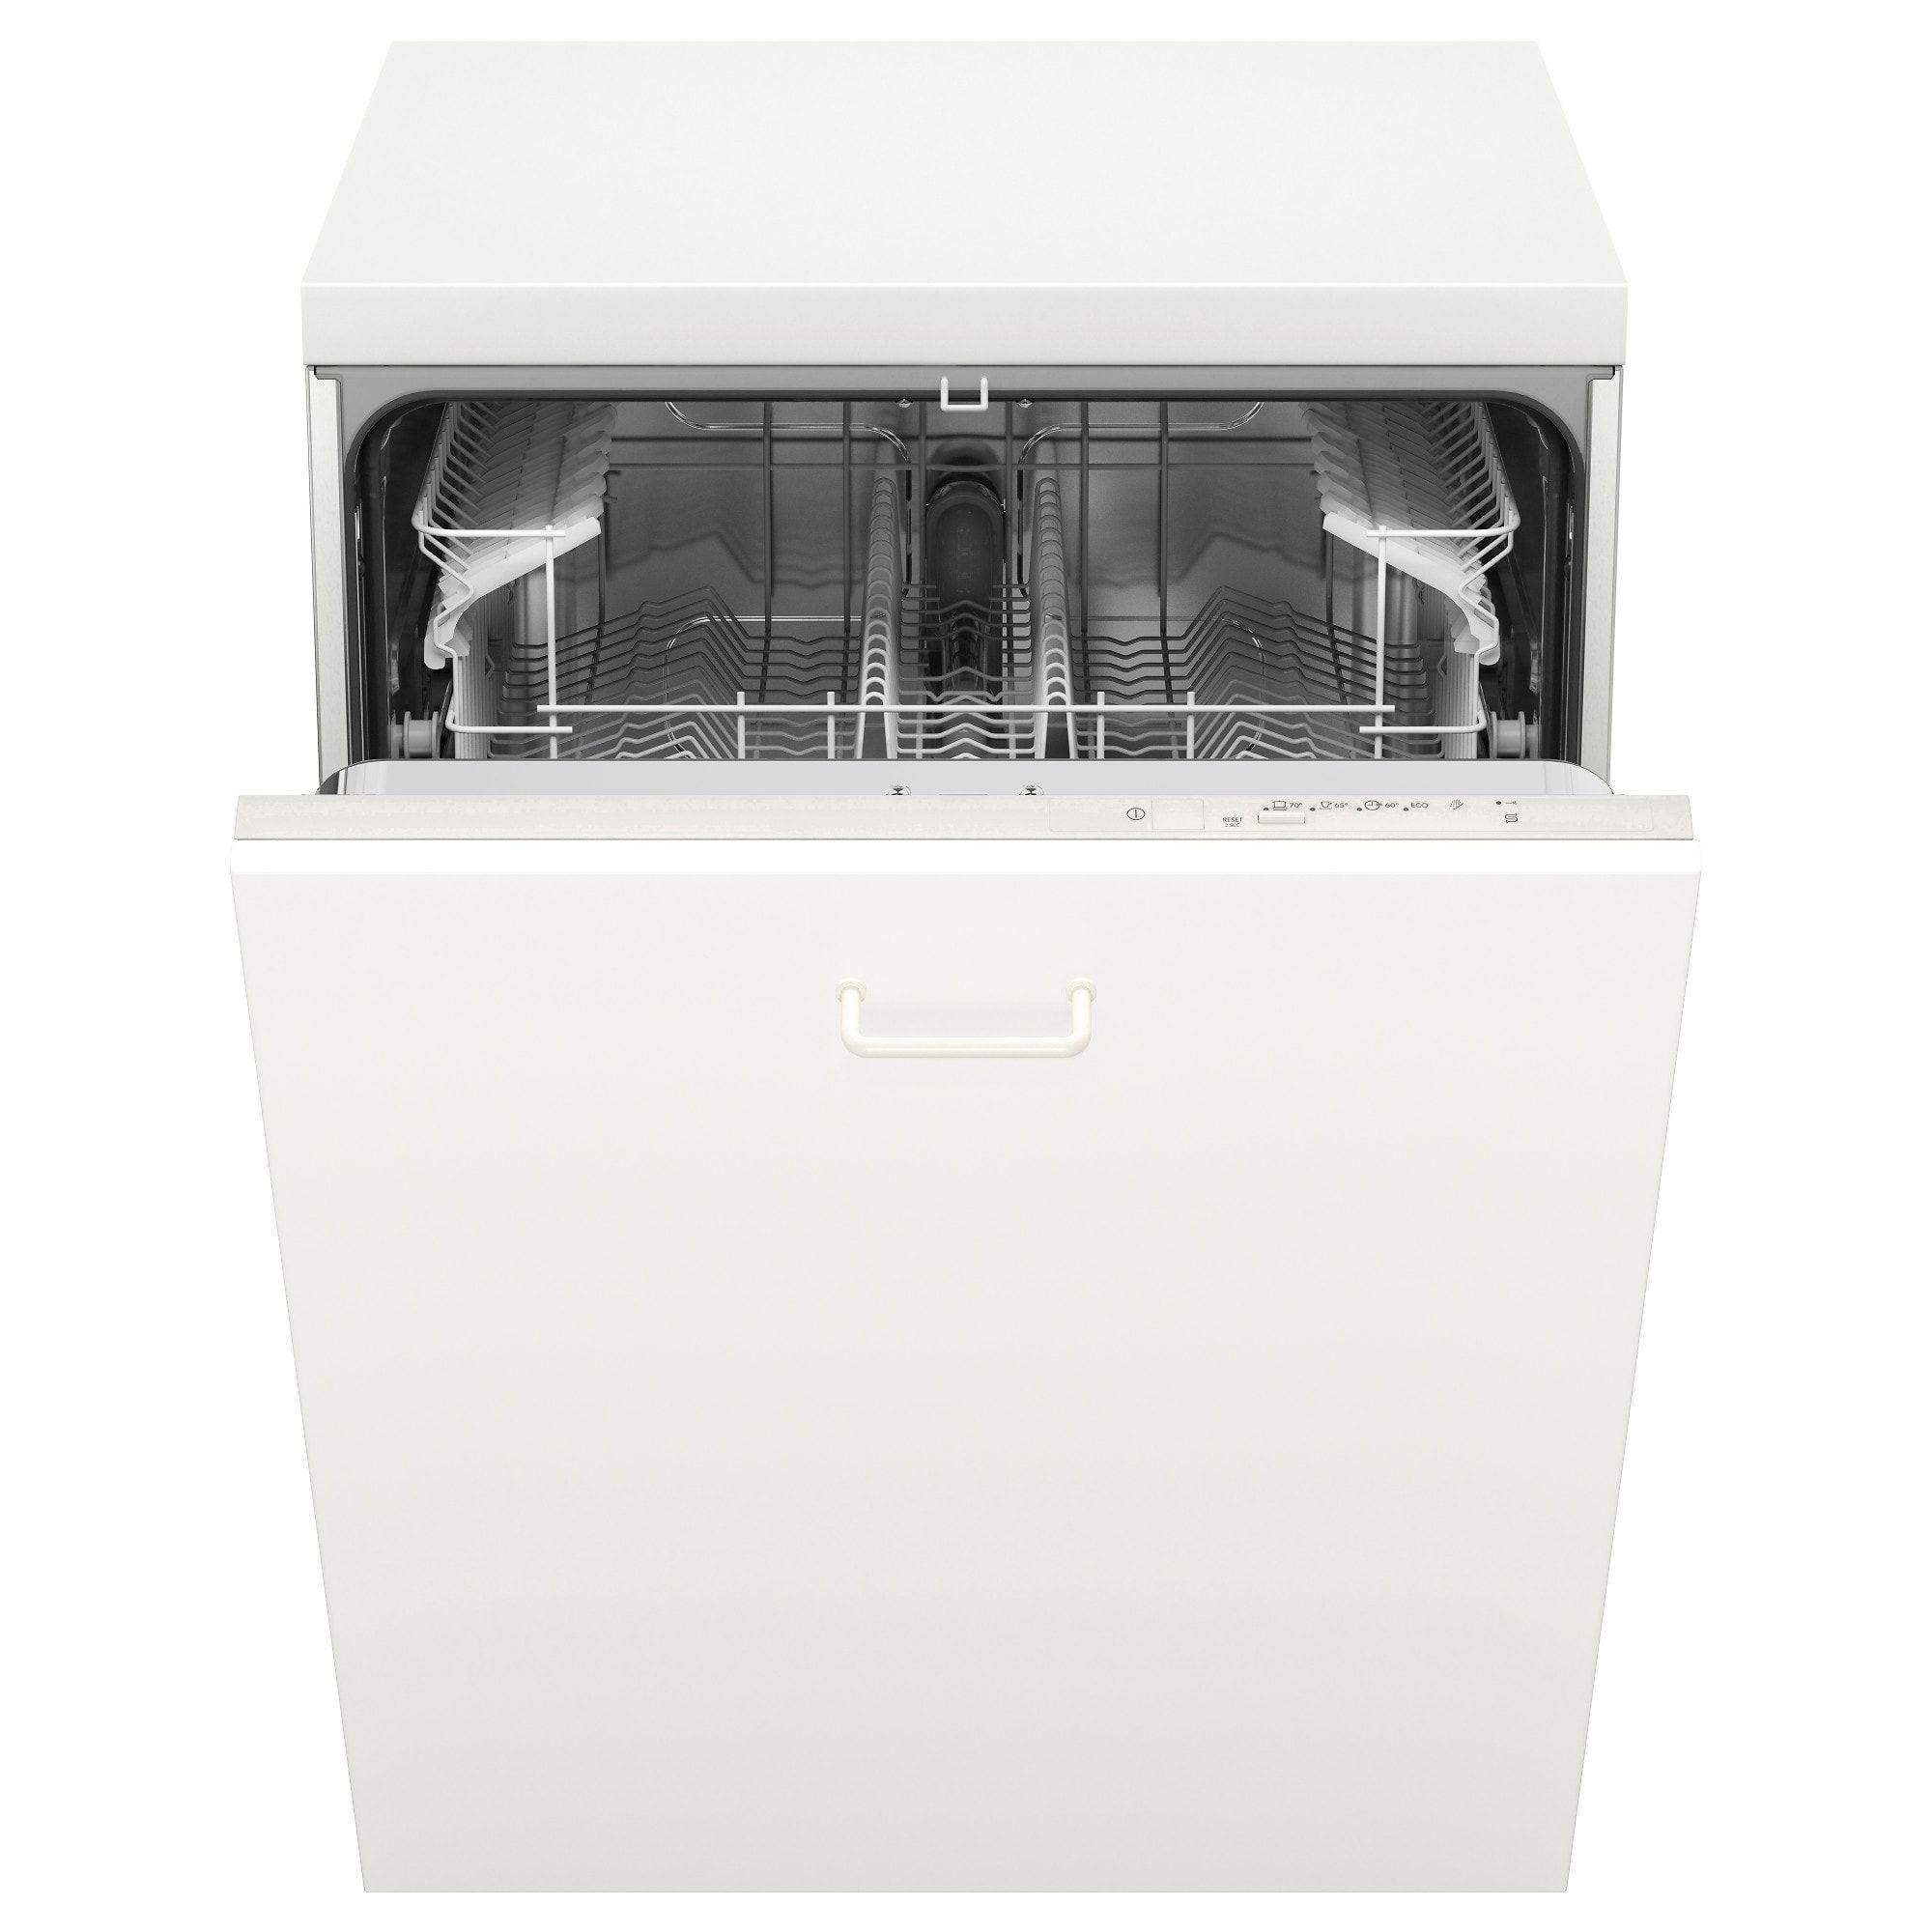 LAGAN Integrated dishwasher, white Integrated dishwasher